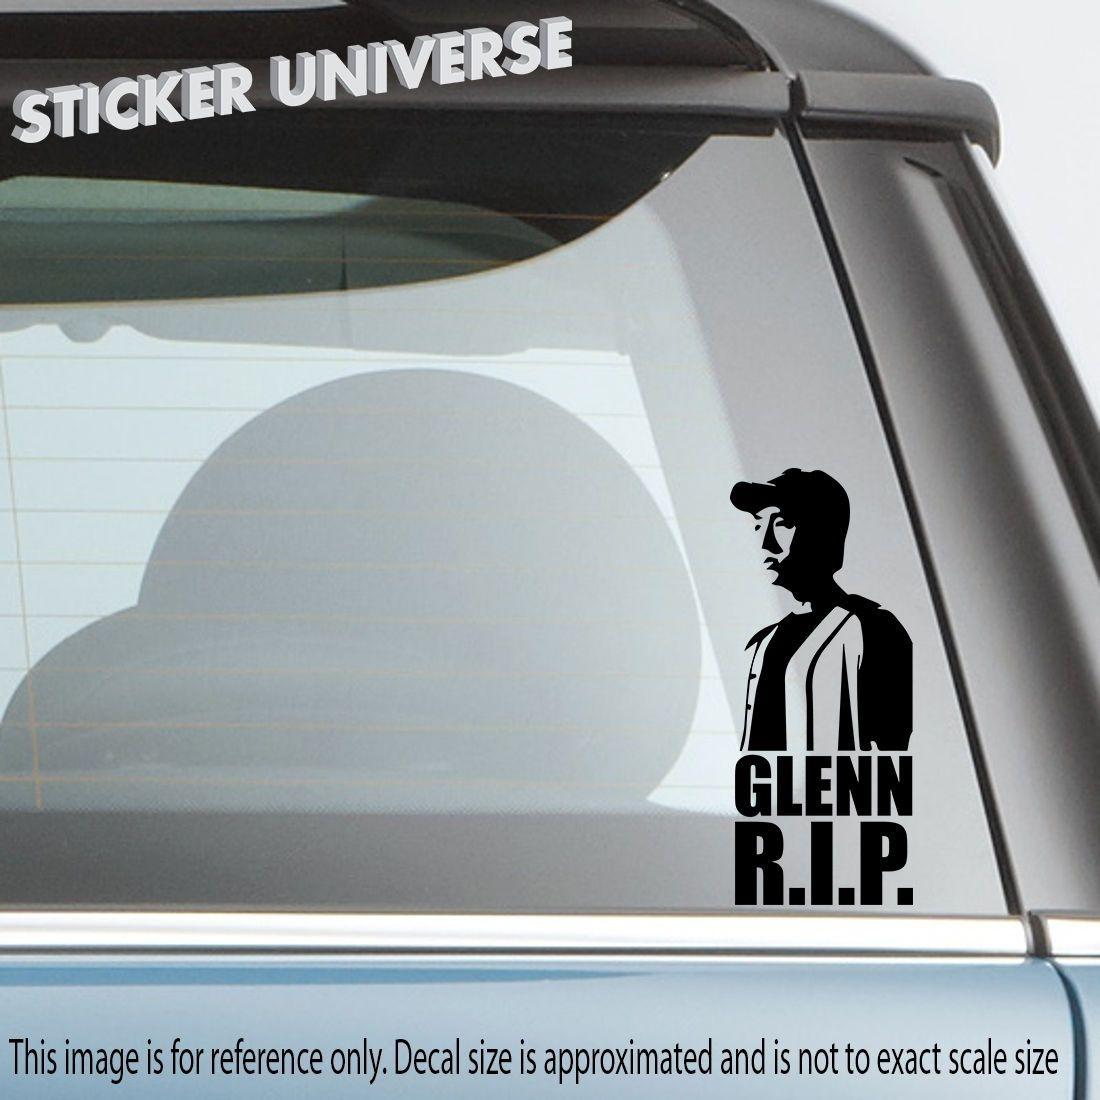 Car styling for r i p glenn silhouette die cut decal bumper sticker 2 5x6 rip walking dead